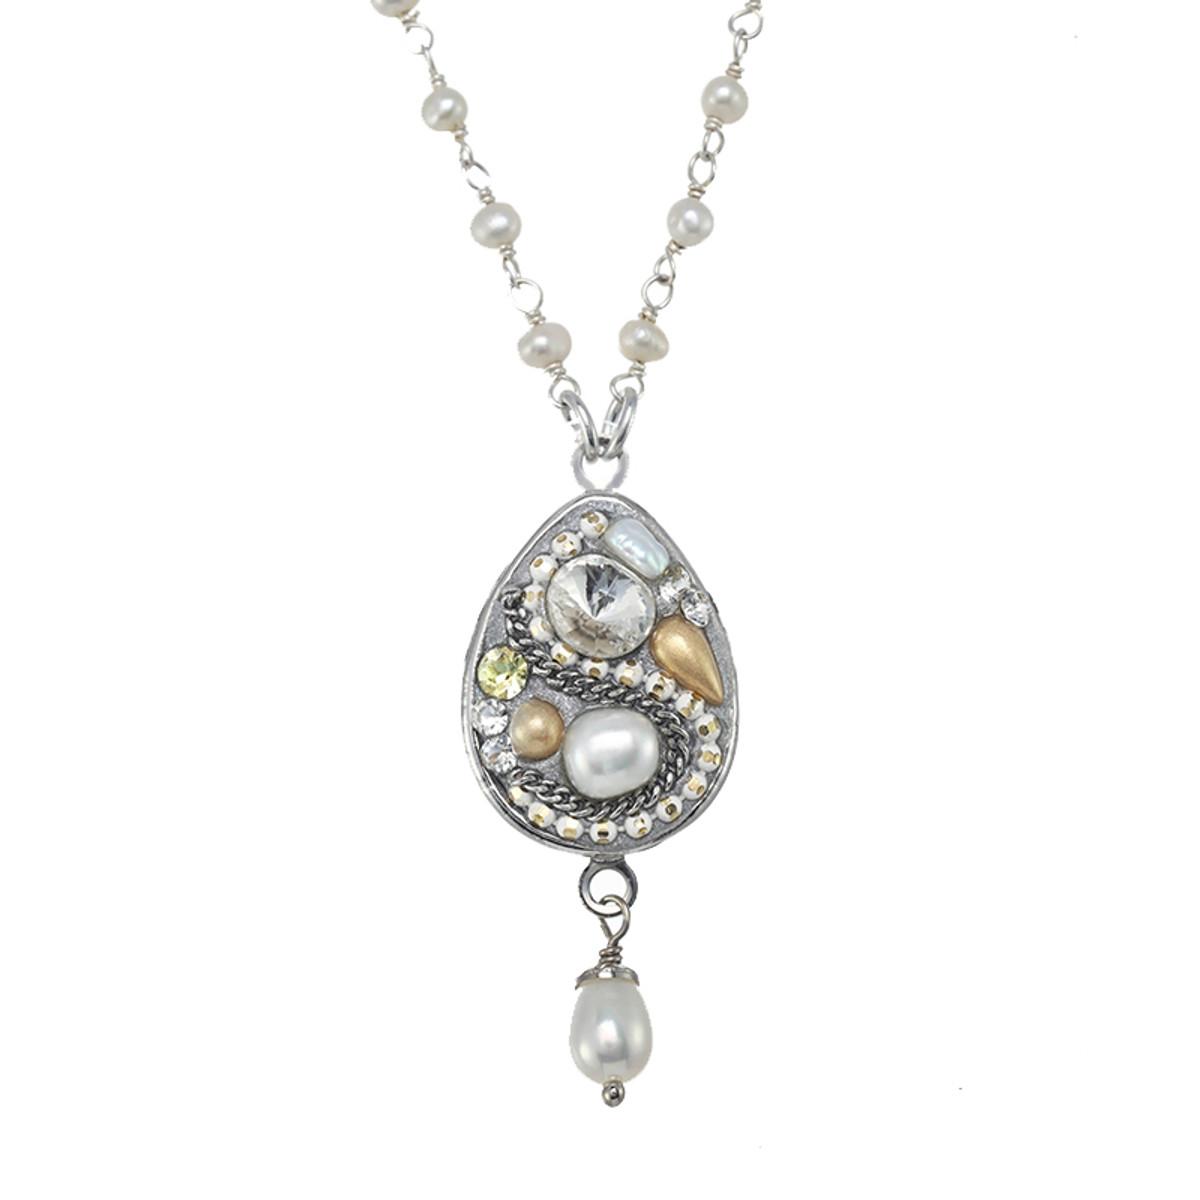 Michal Golan Moonlight Drop Necklace